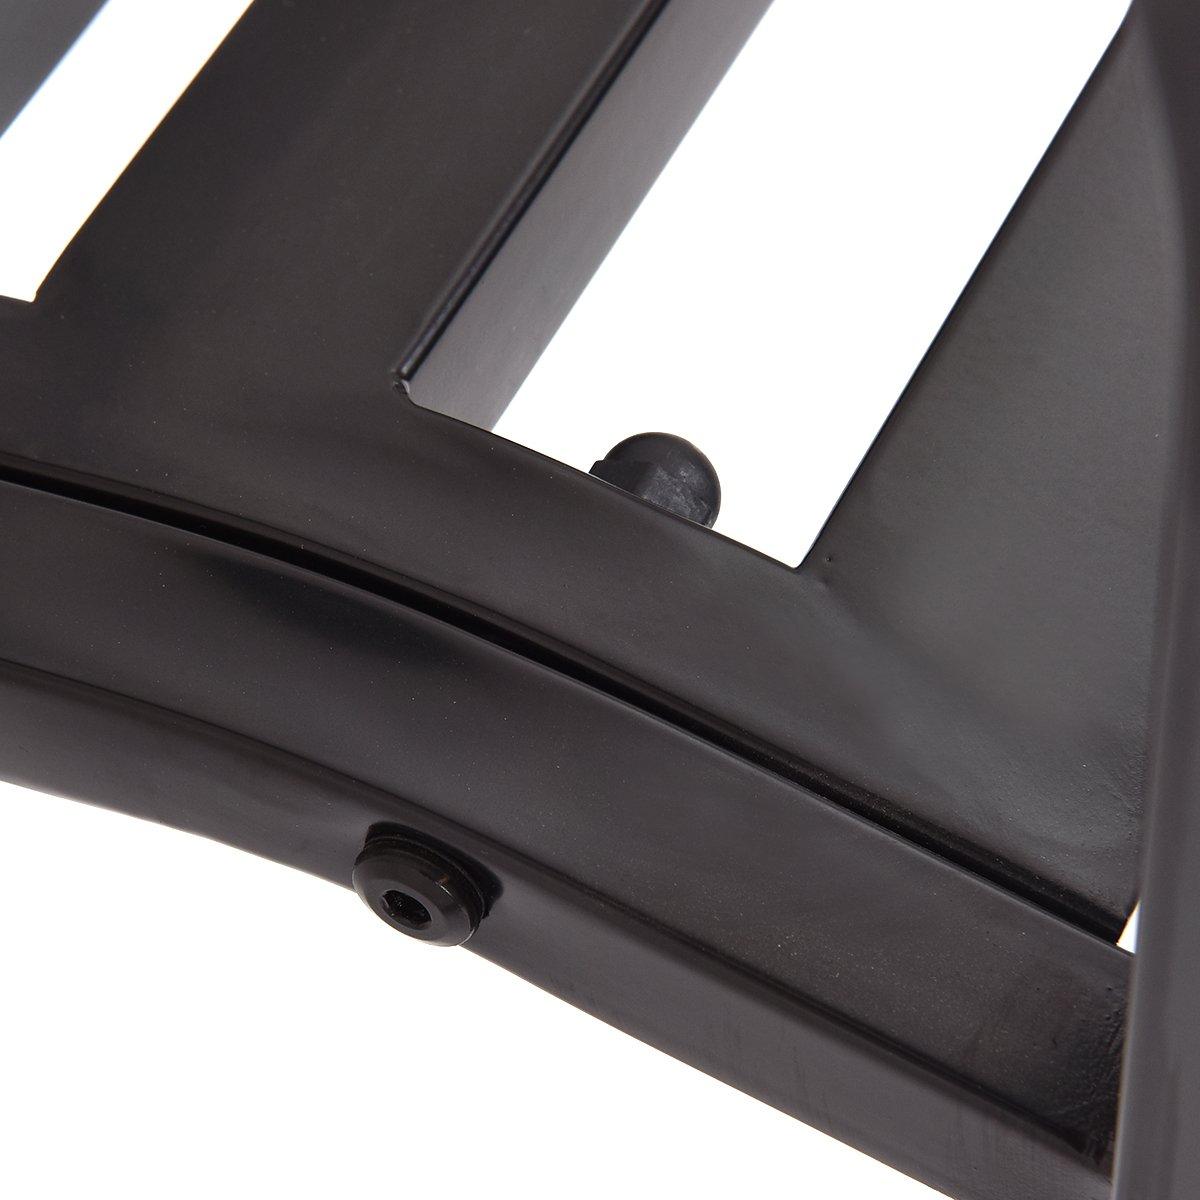 Giantex 50'' Patio Garden Bench Loveseats Park Yard Furniture Decor Cast Iron Frame Black (Black Style 1) by Giantex (Image #5)